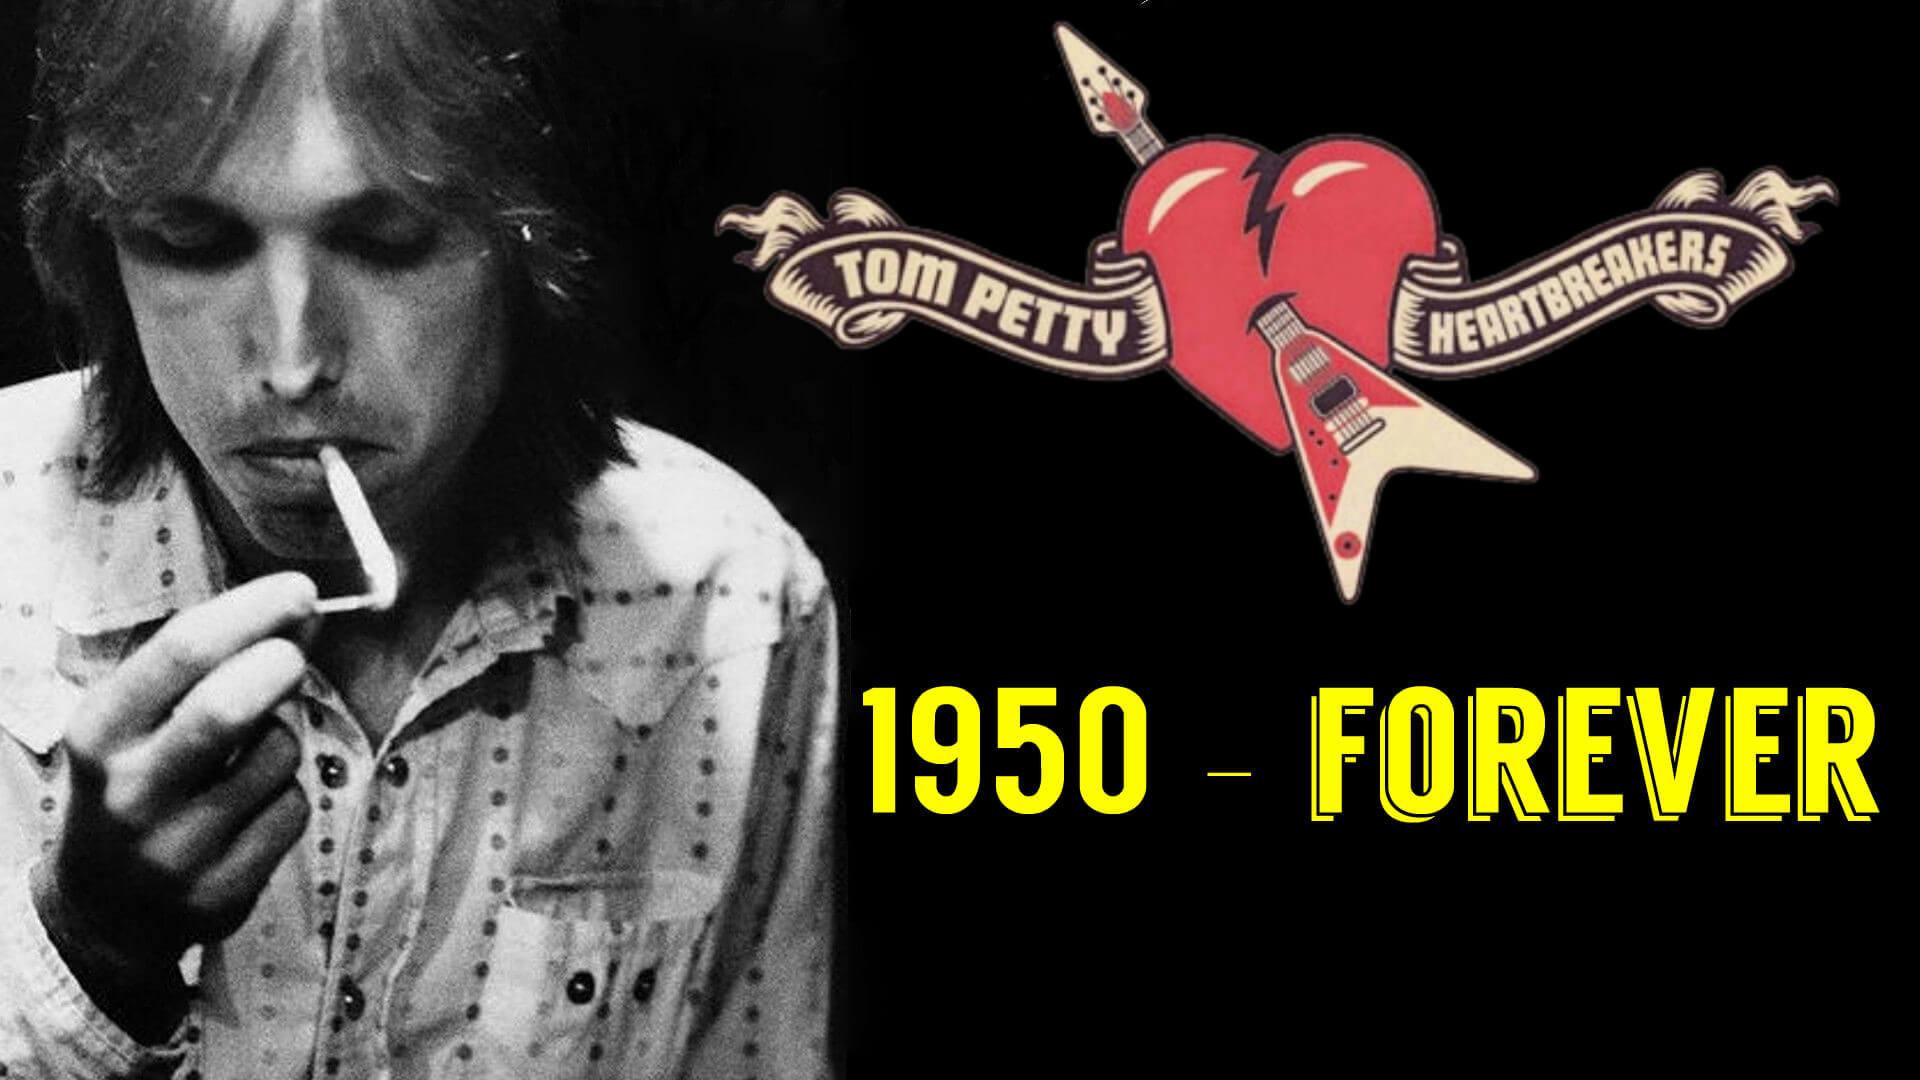 Tom Petty Rip Rock And Roll Garage